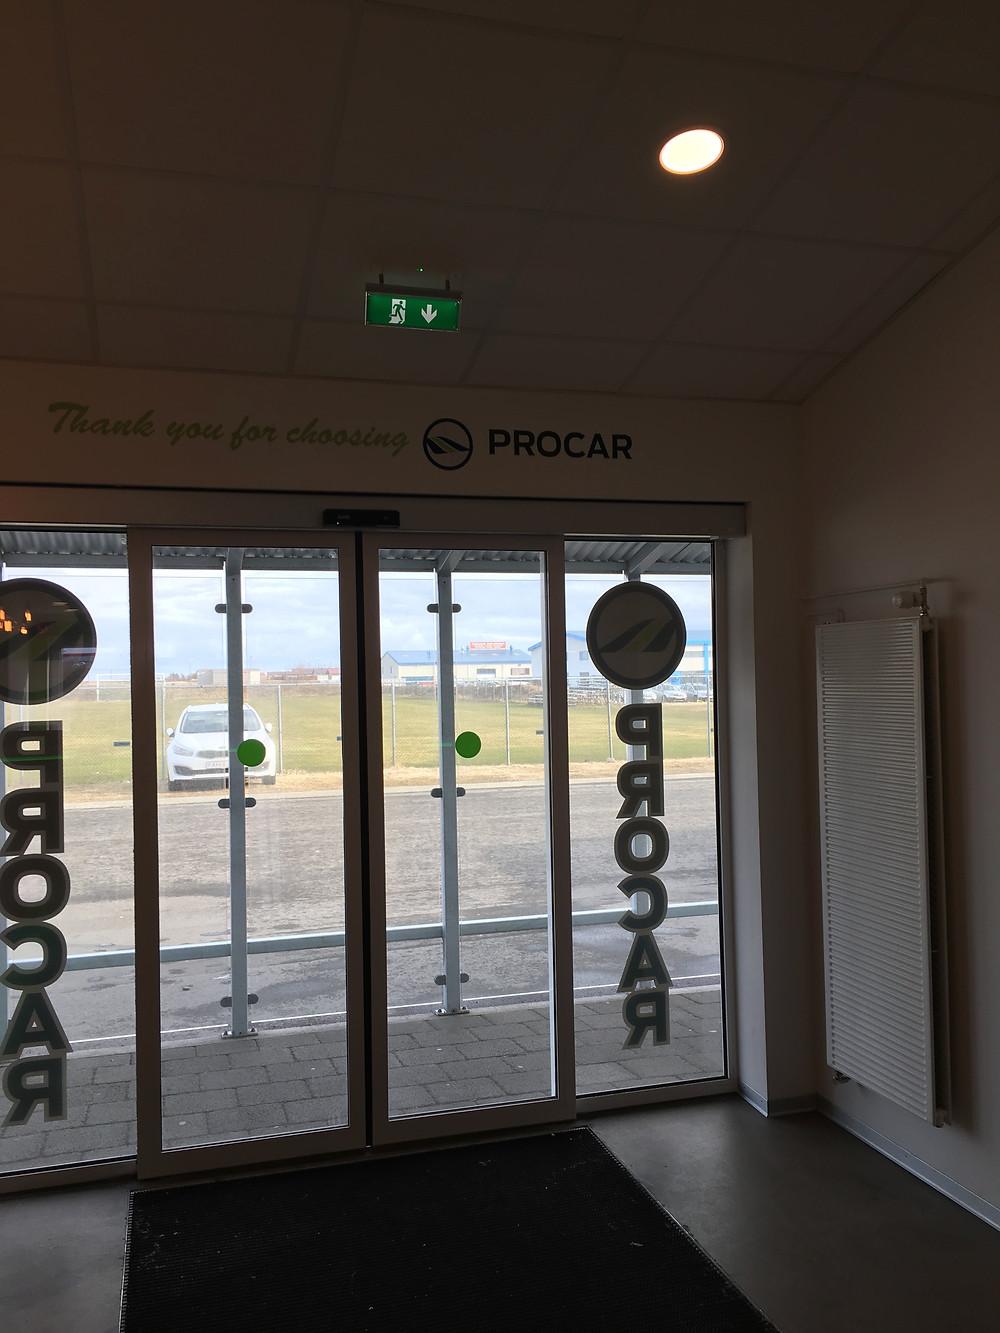 Procar Reykjavik